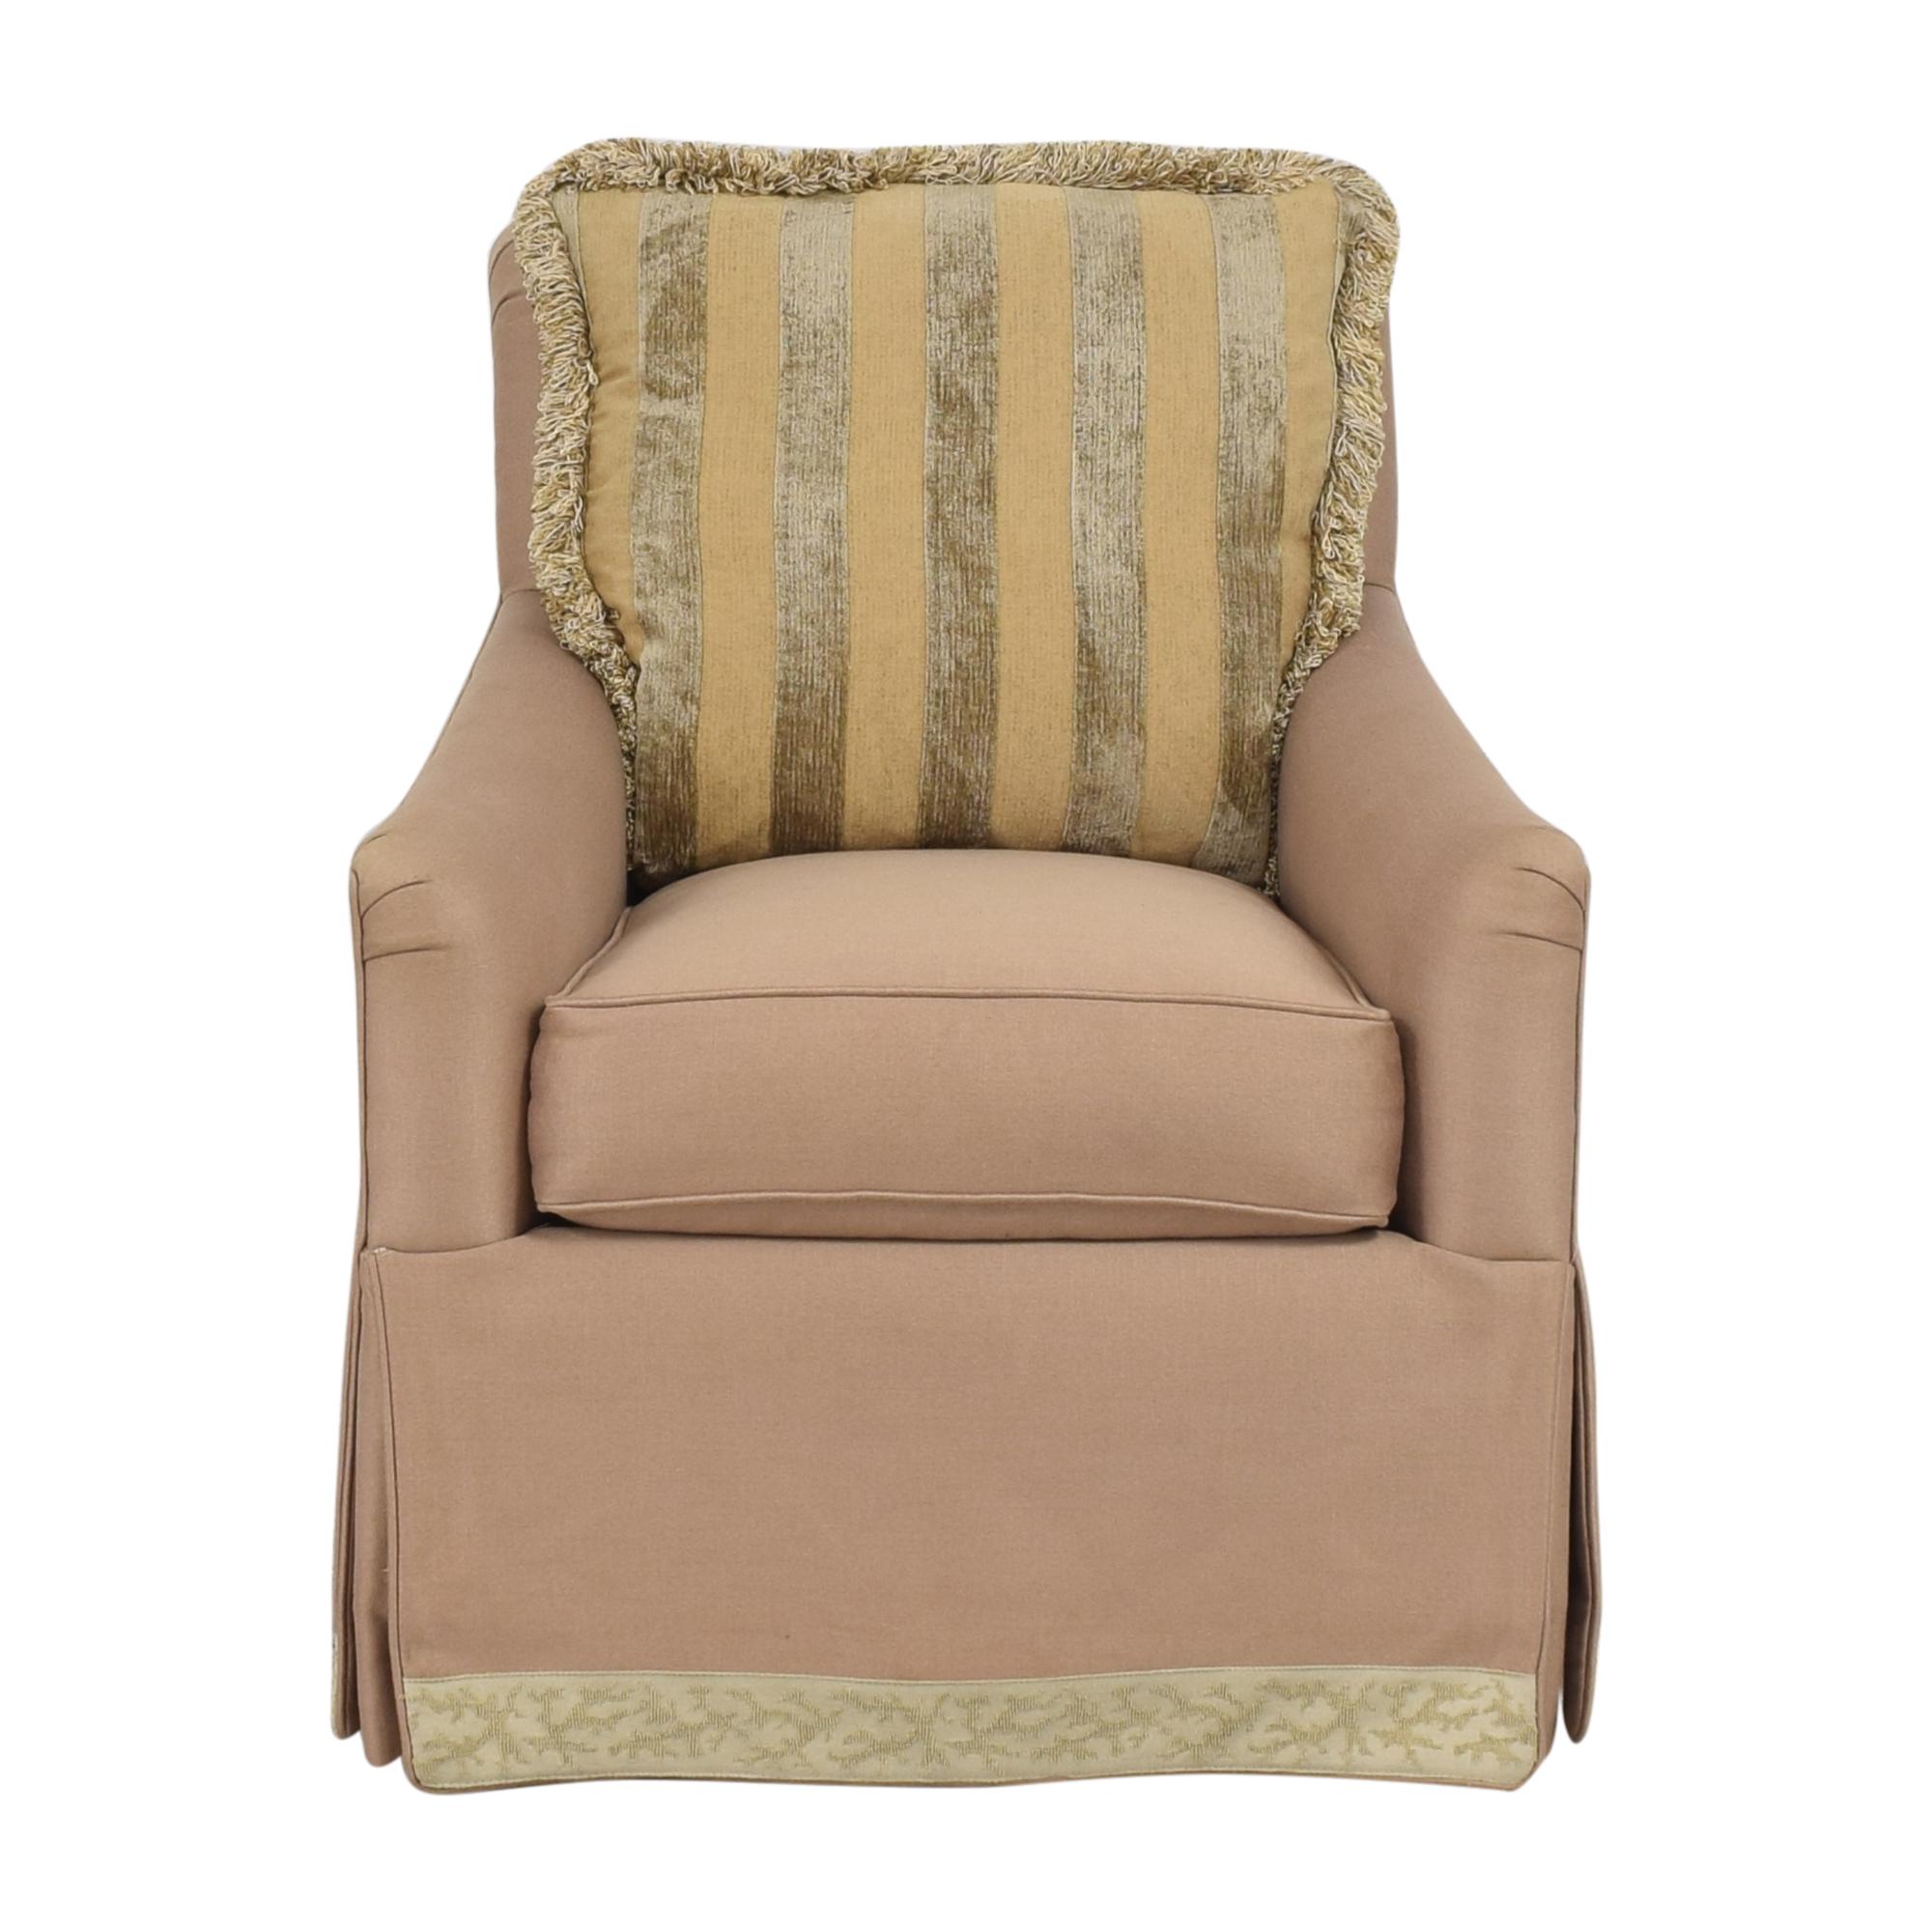 Tomlinson Erwin-Lambeth Upholstered Swivel Chair / Chairs